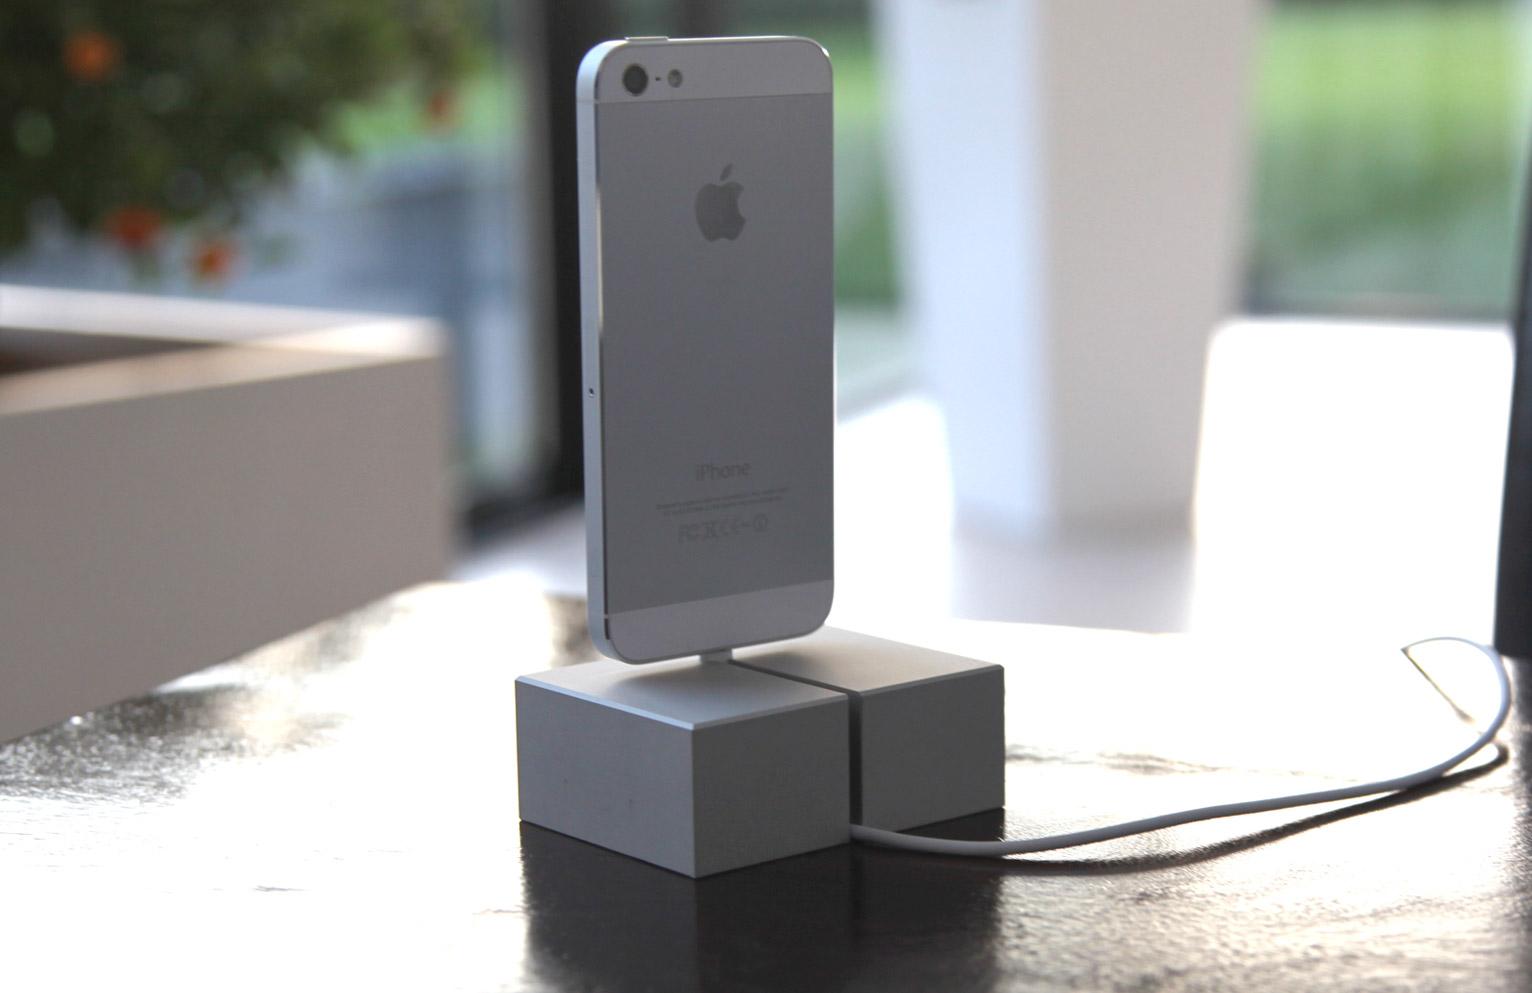 Nächste Woche lieferbar: Sir James das iPhone 5 Dock | arktis.de Blog